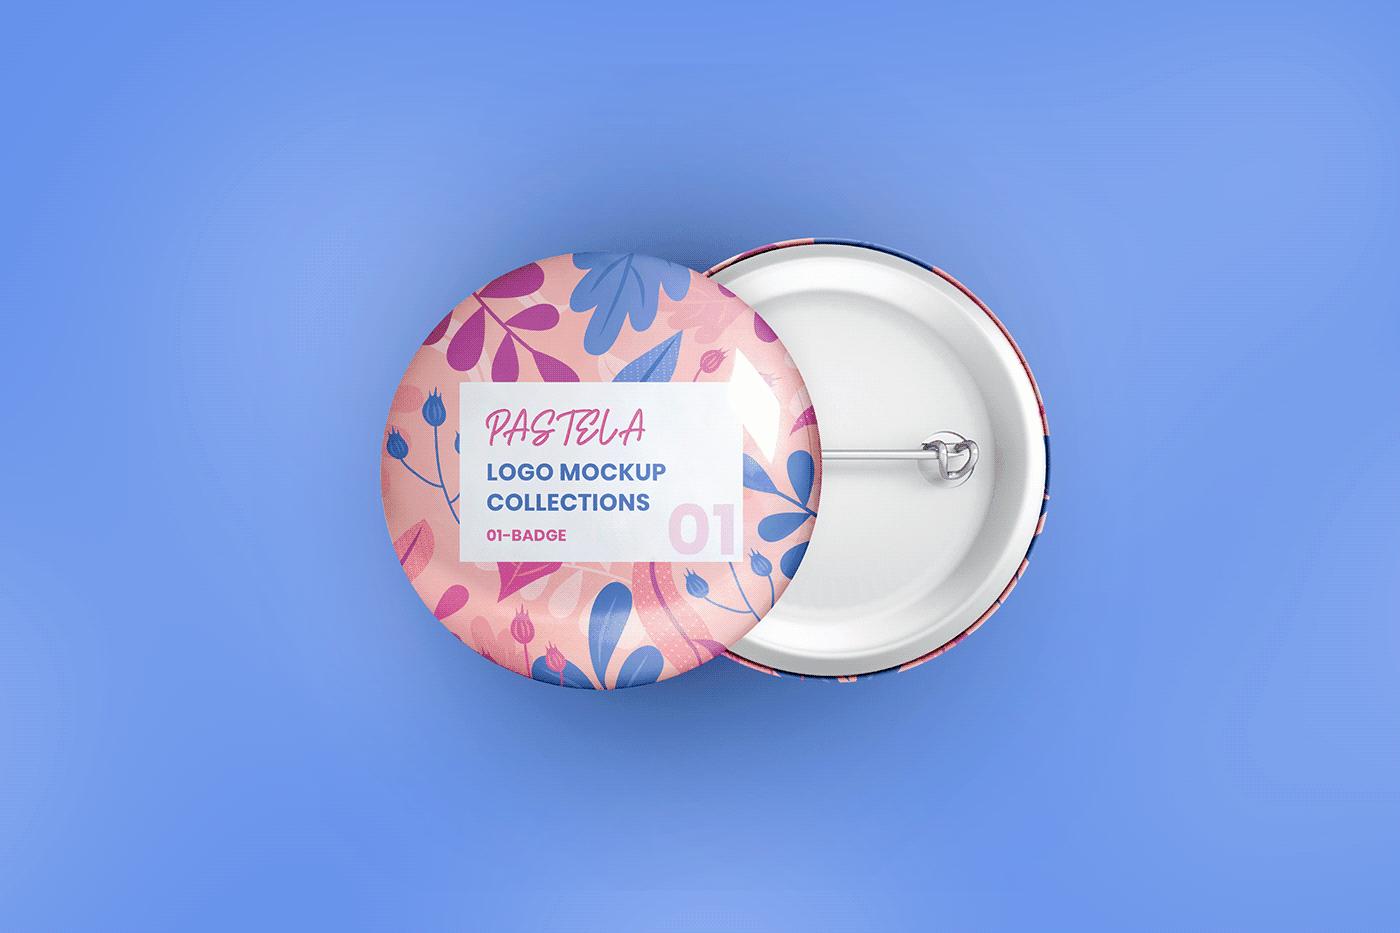 20 Mockup Pastela Logo Mockup Collection (PSD)